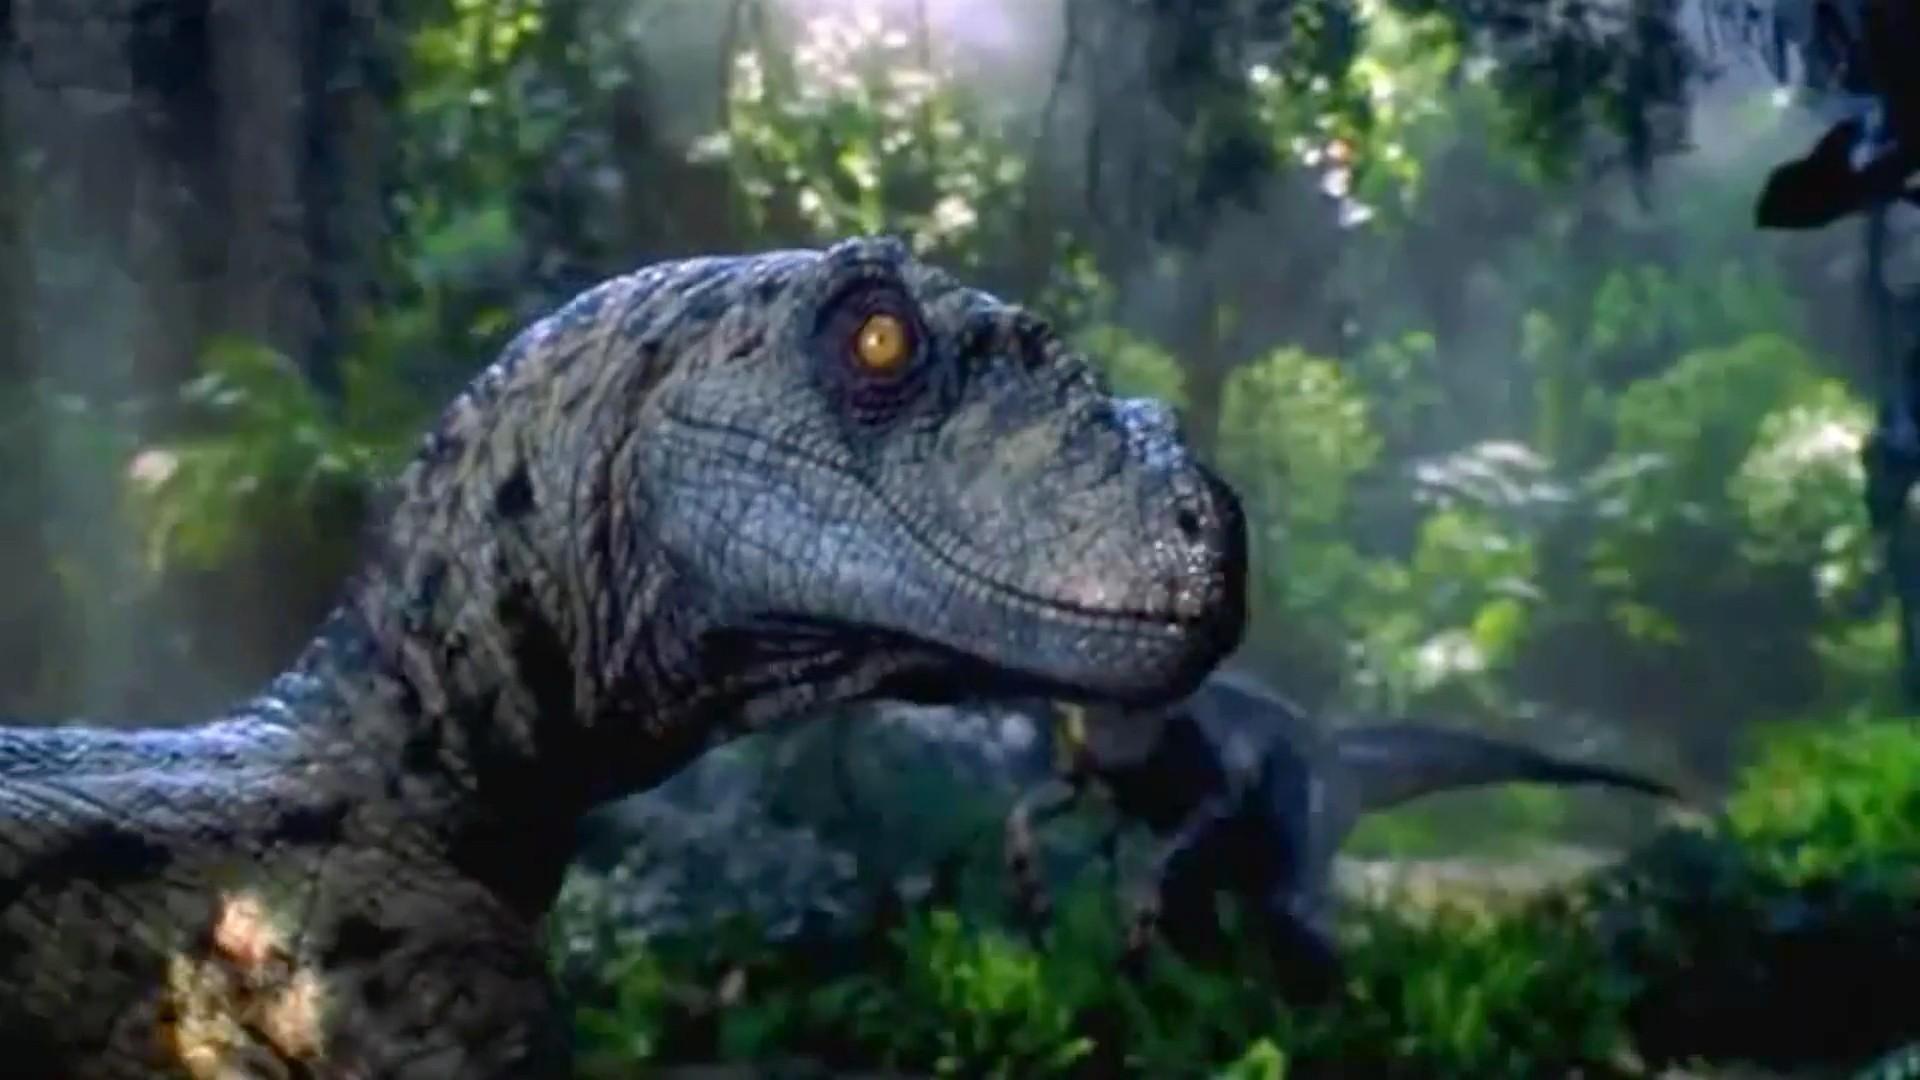 Jurassic Park movie, jurassic world ride at universal studios hollywood